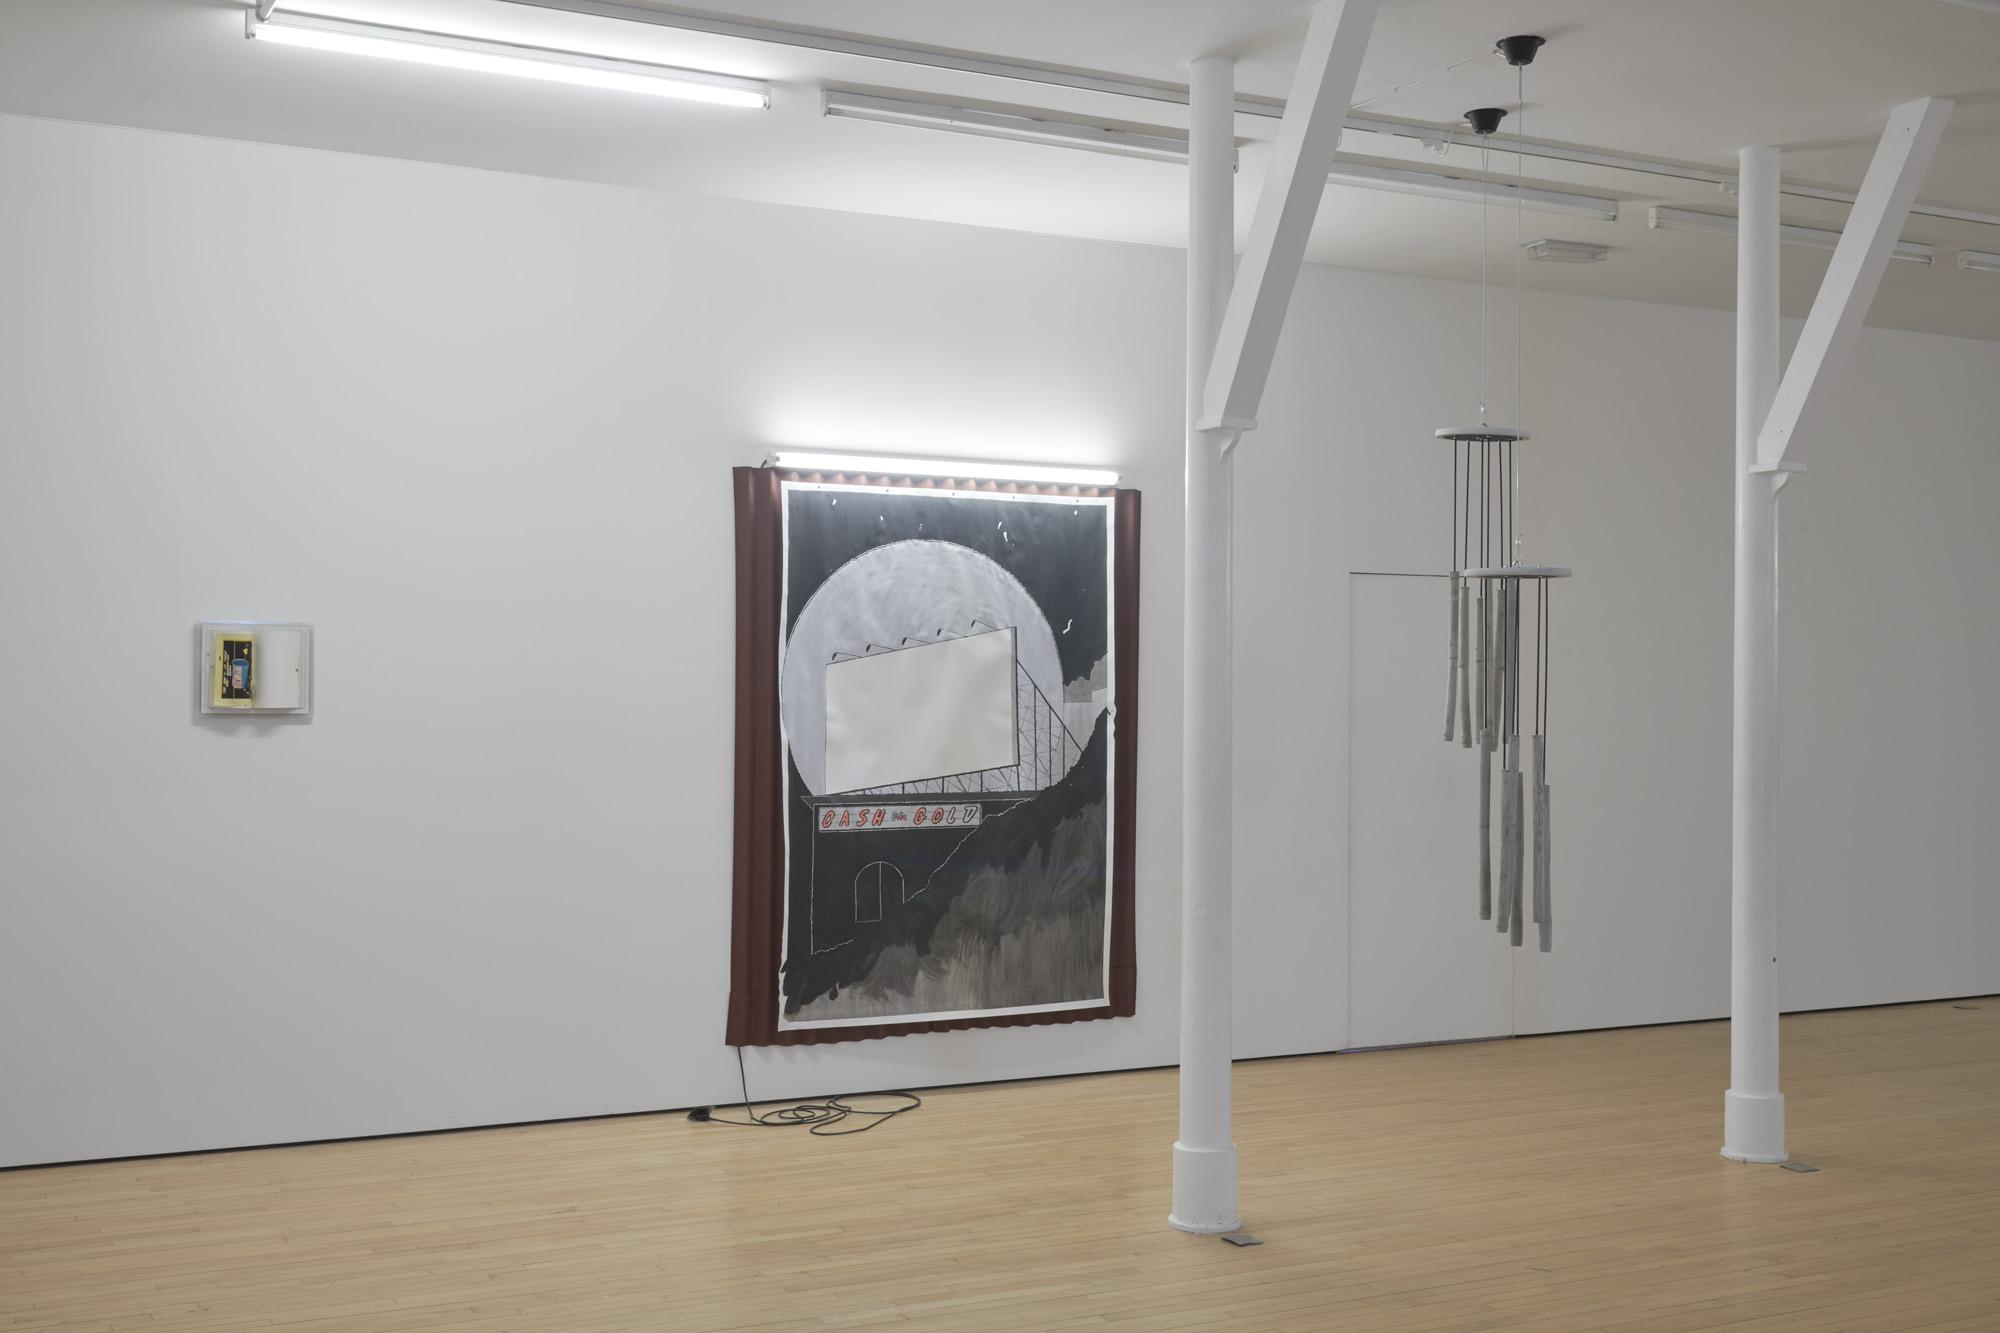 Charlie Godet Thomas, DIM LIT, 2019. Installation view. Assembly Point, London, UK.